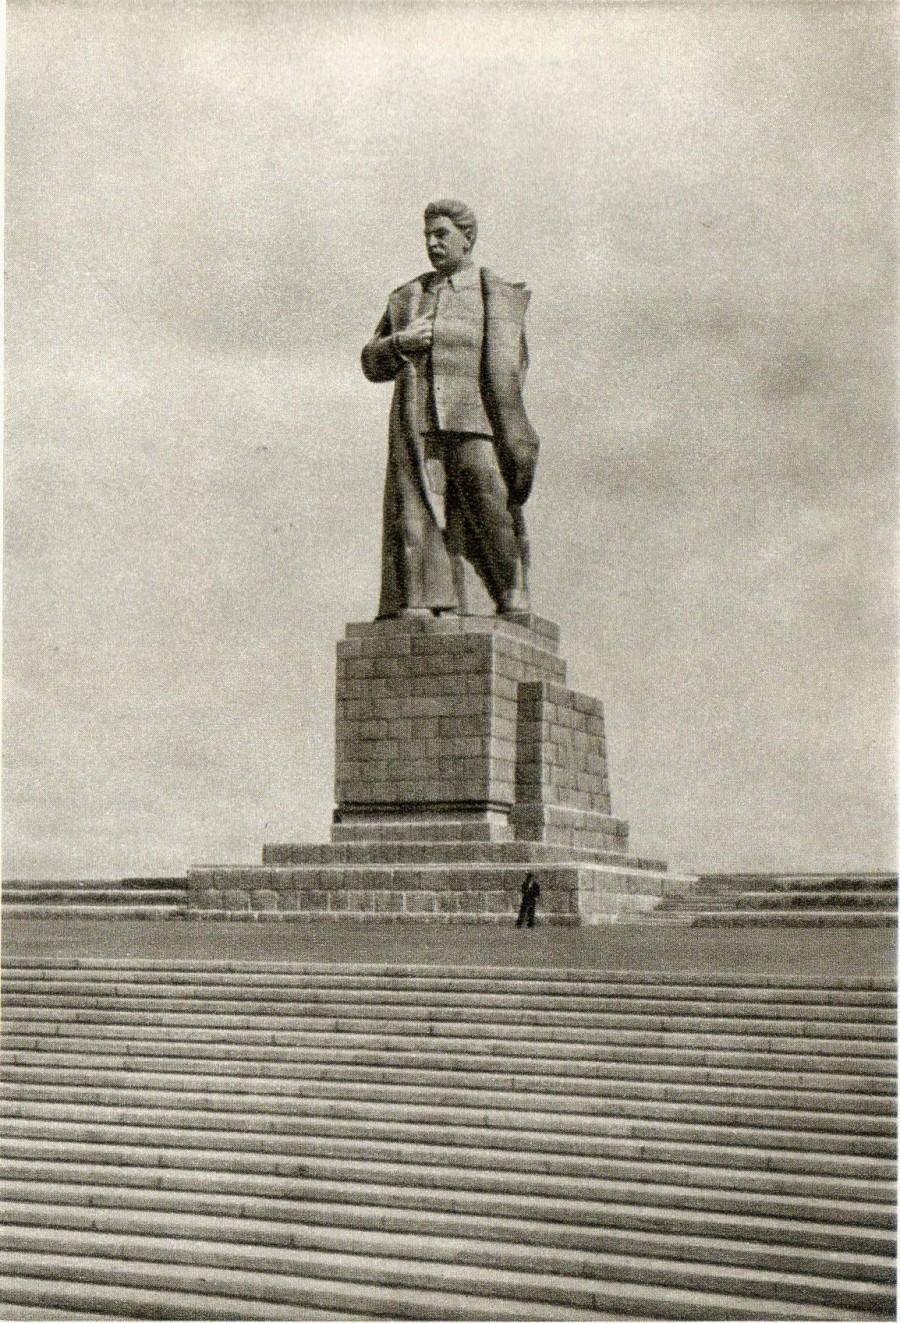 http://anashina.com/wp-content/uploads/2015/08/Stalin-1-900x1323.jpg